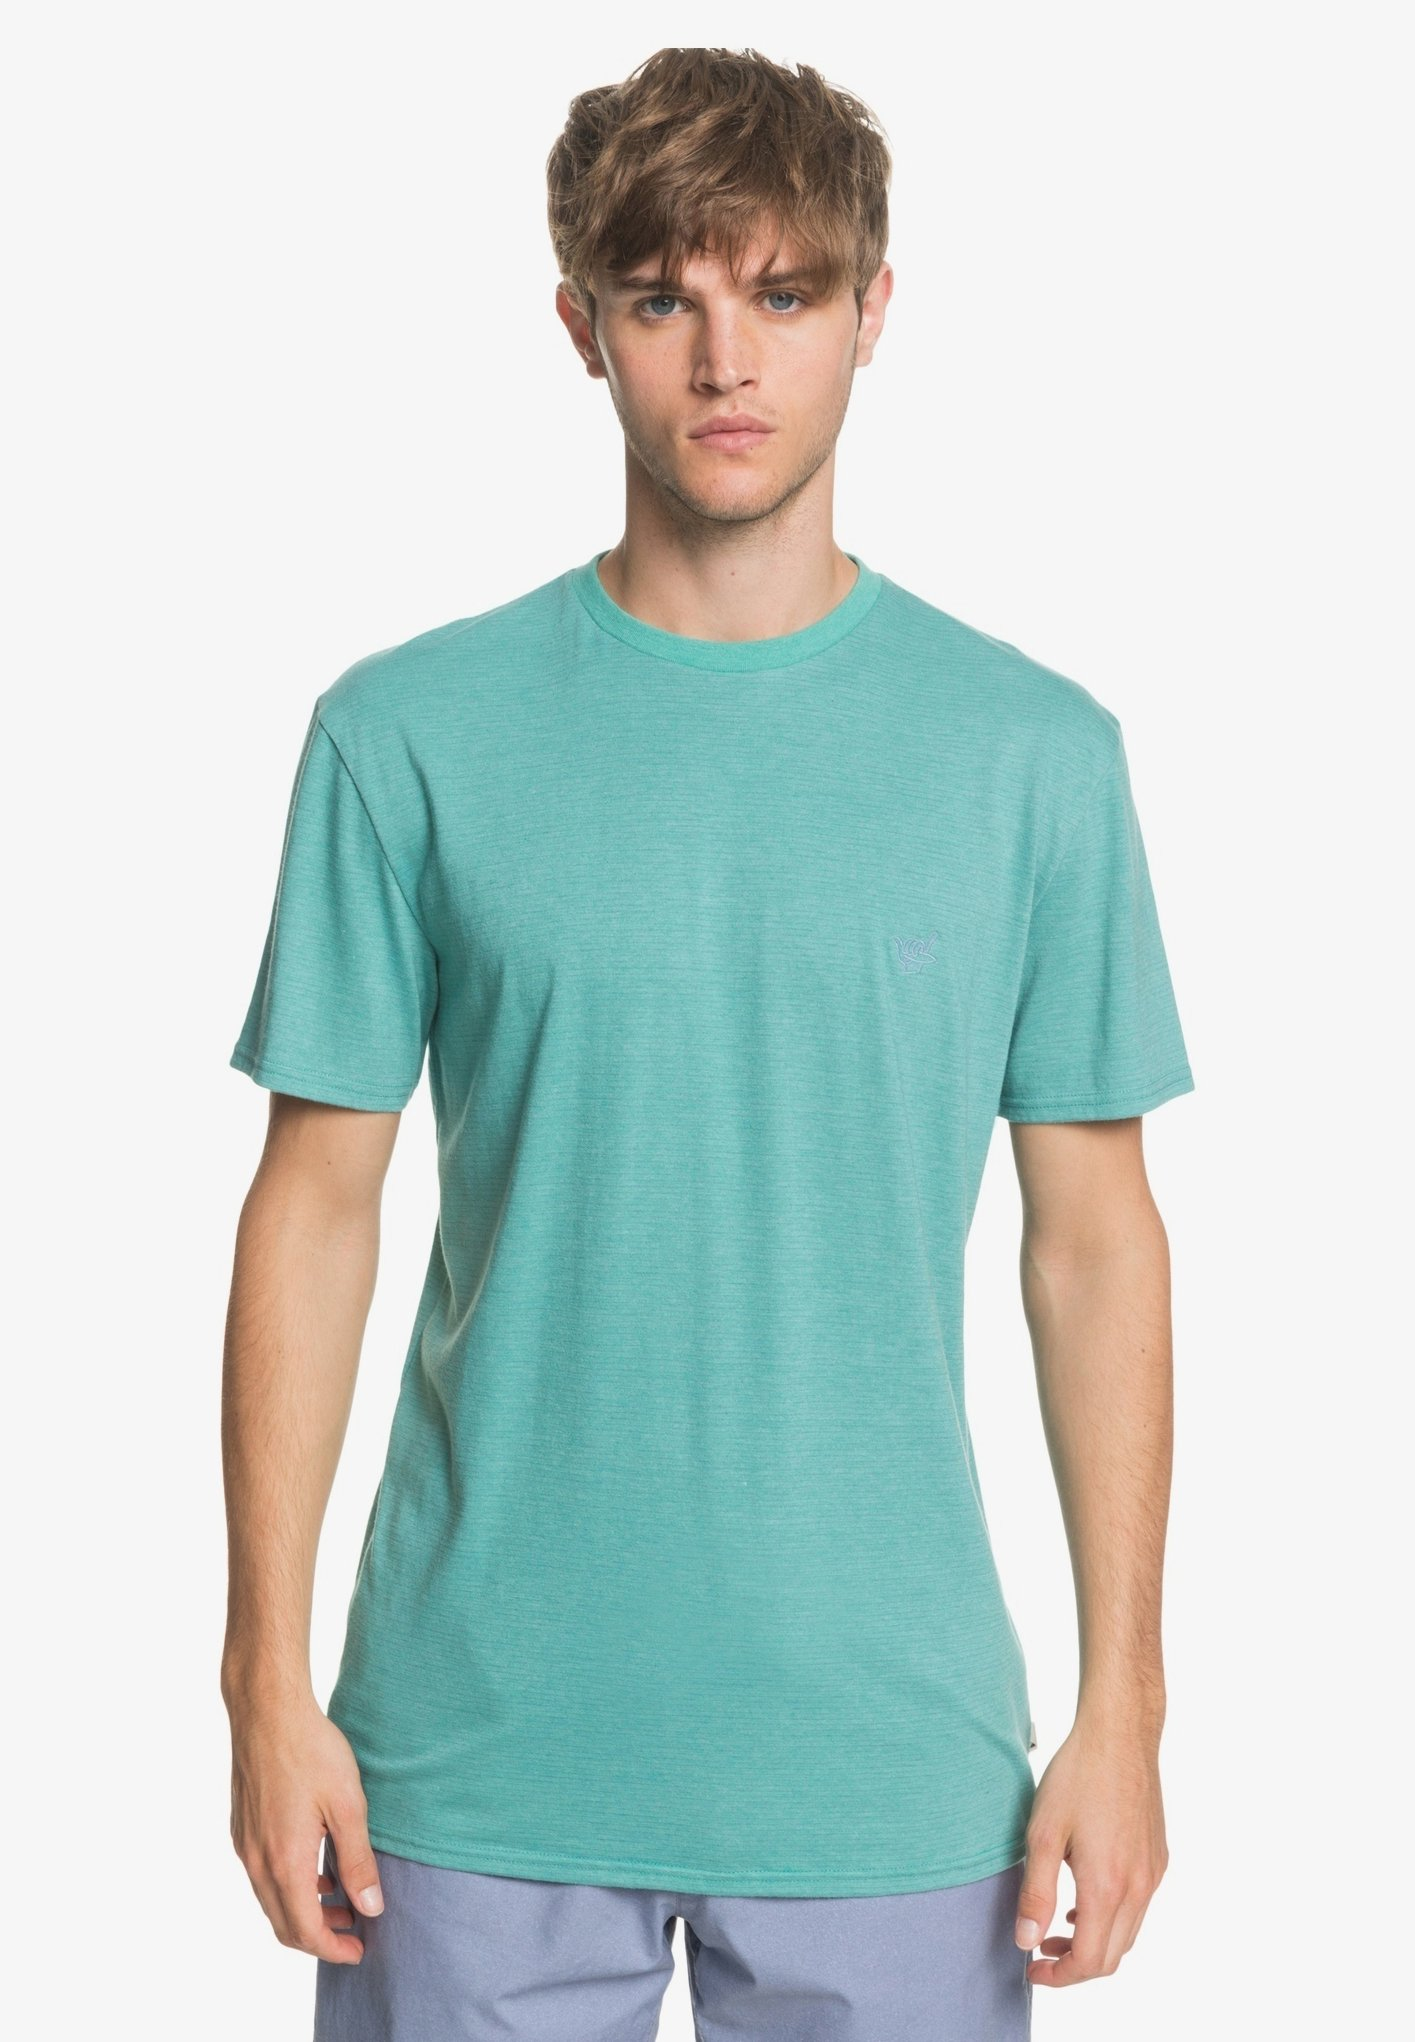 Homme ARBOLITO - T-shirt imprimé - sea blue